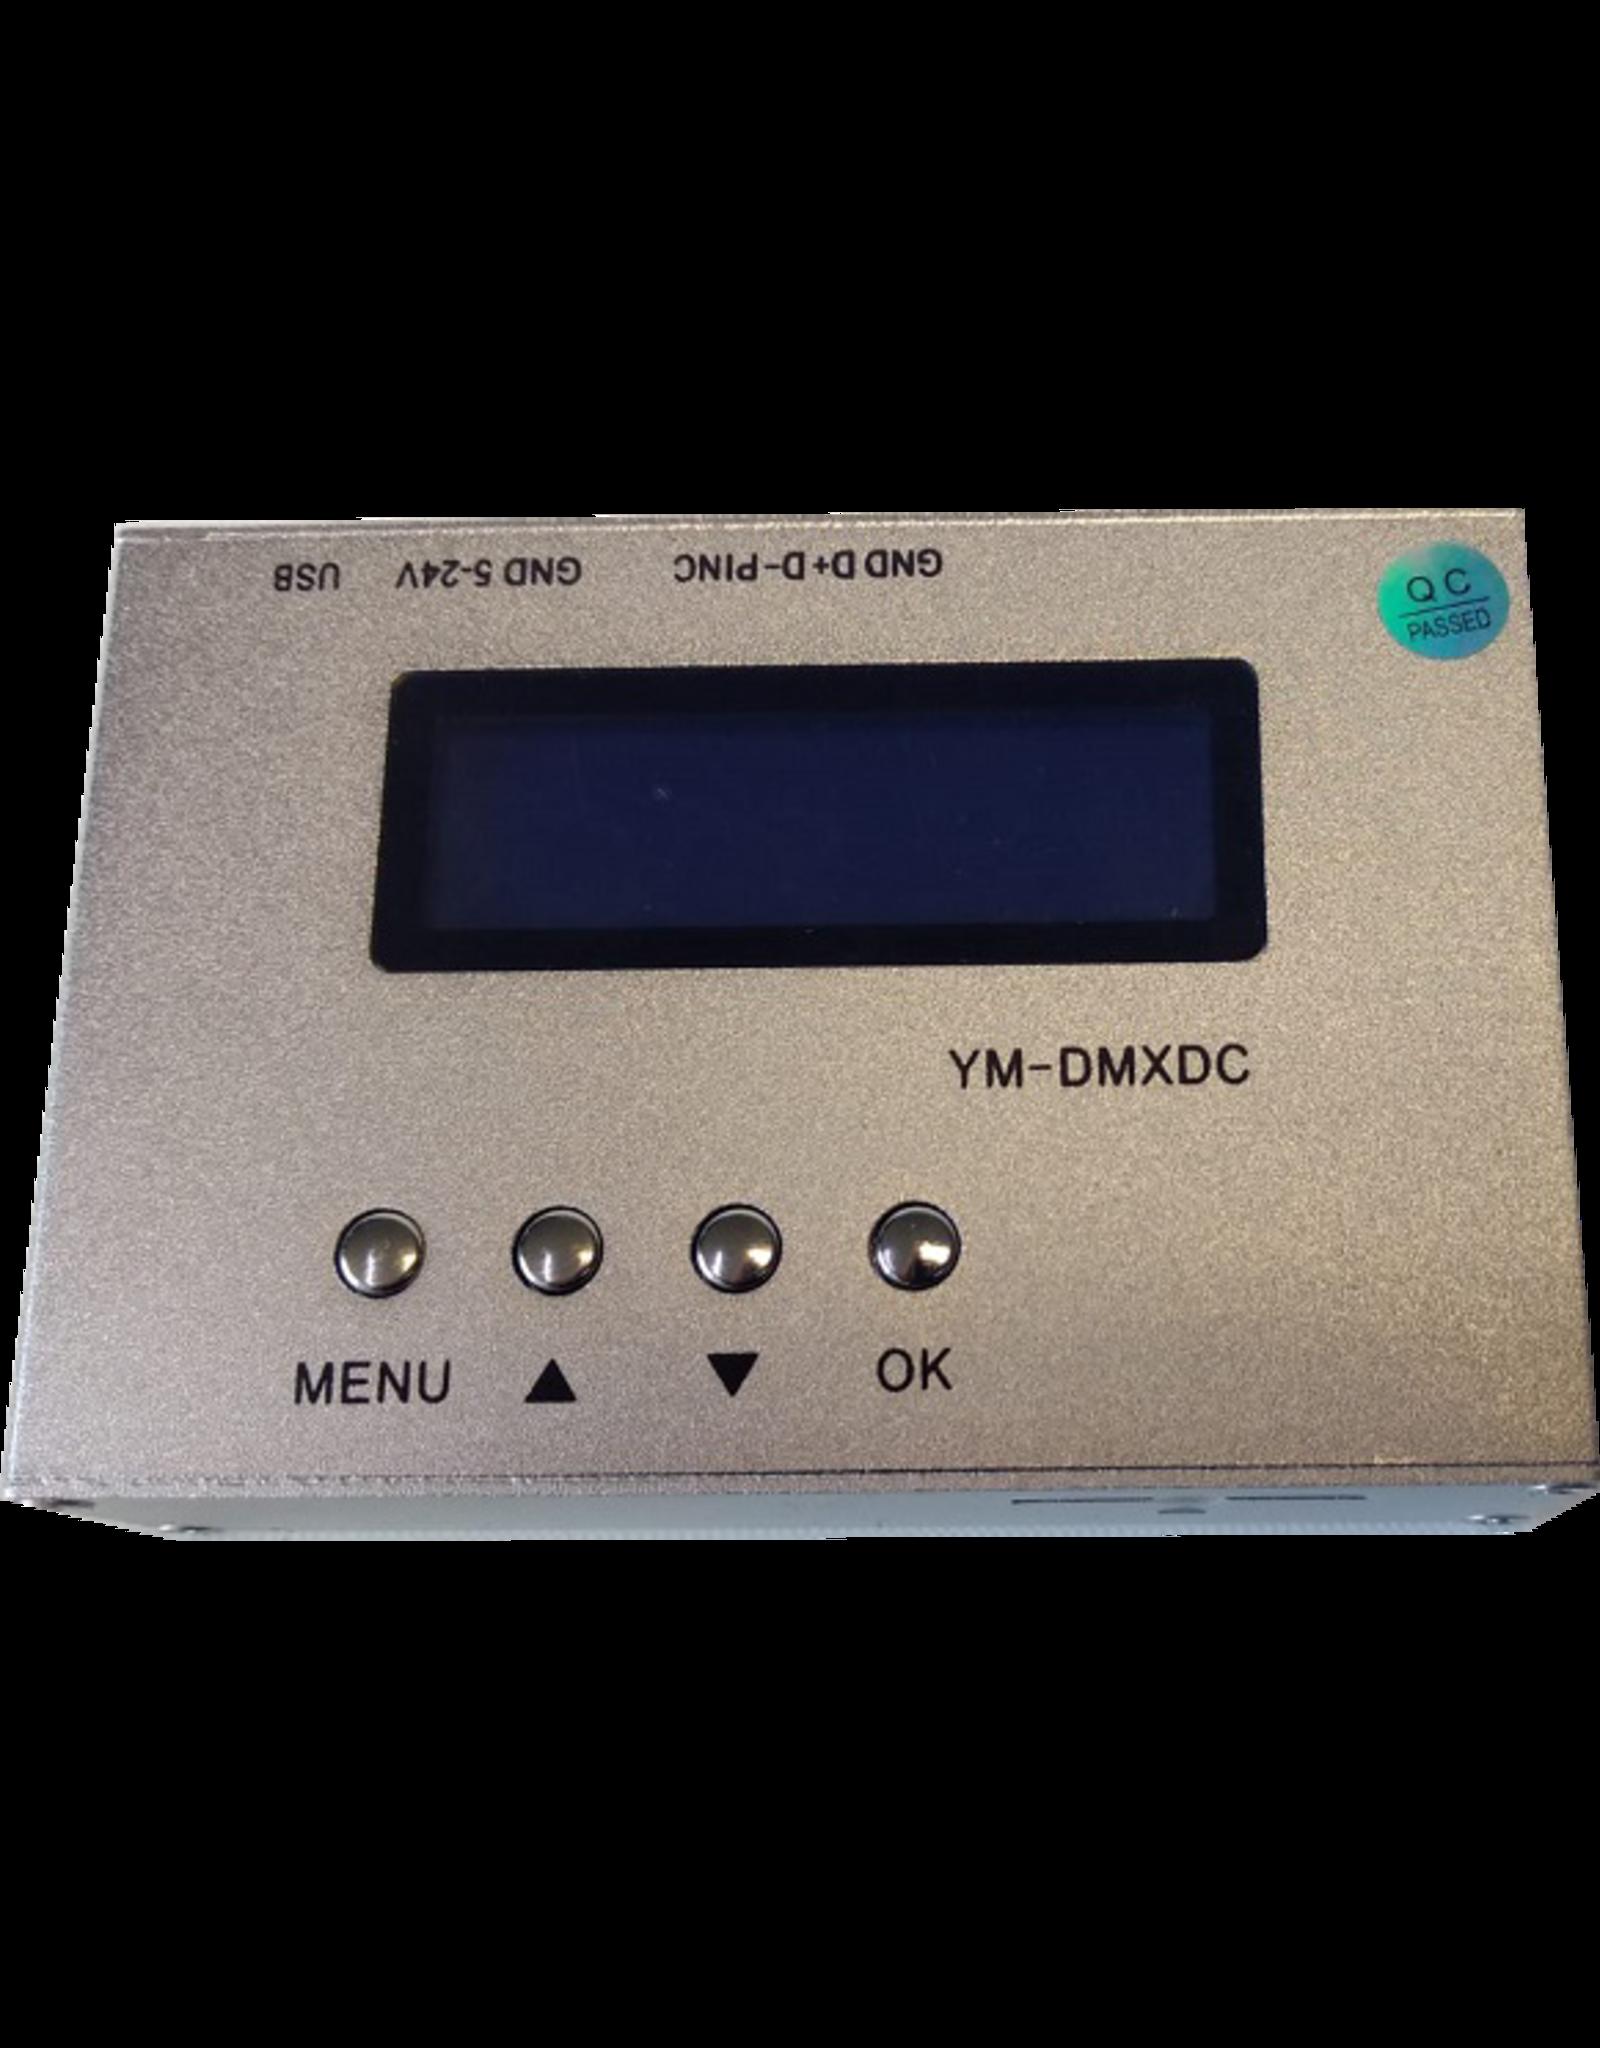 Lights Dmx Tool 1 - DMX address setting for Ekspoled RGB dmx and CW/WWdmx